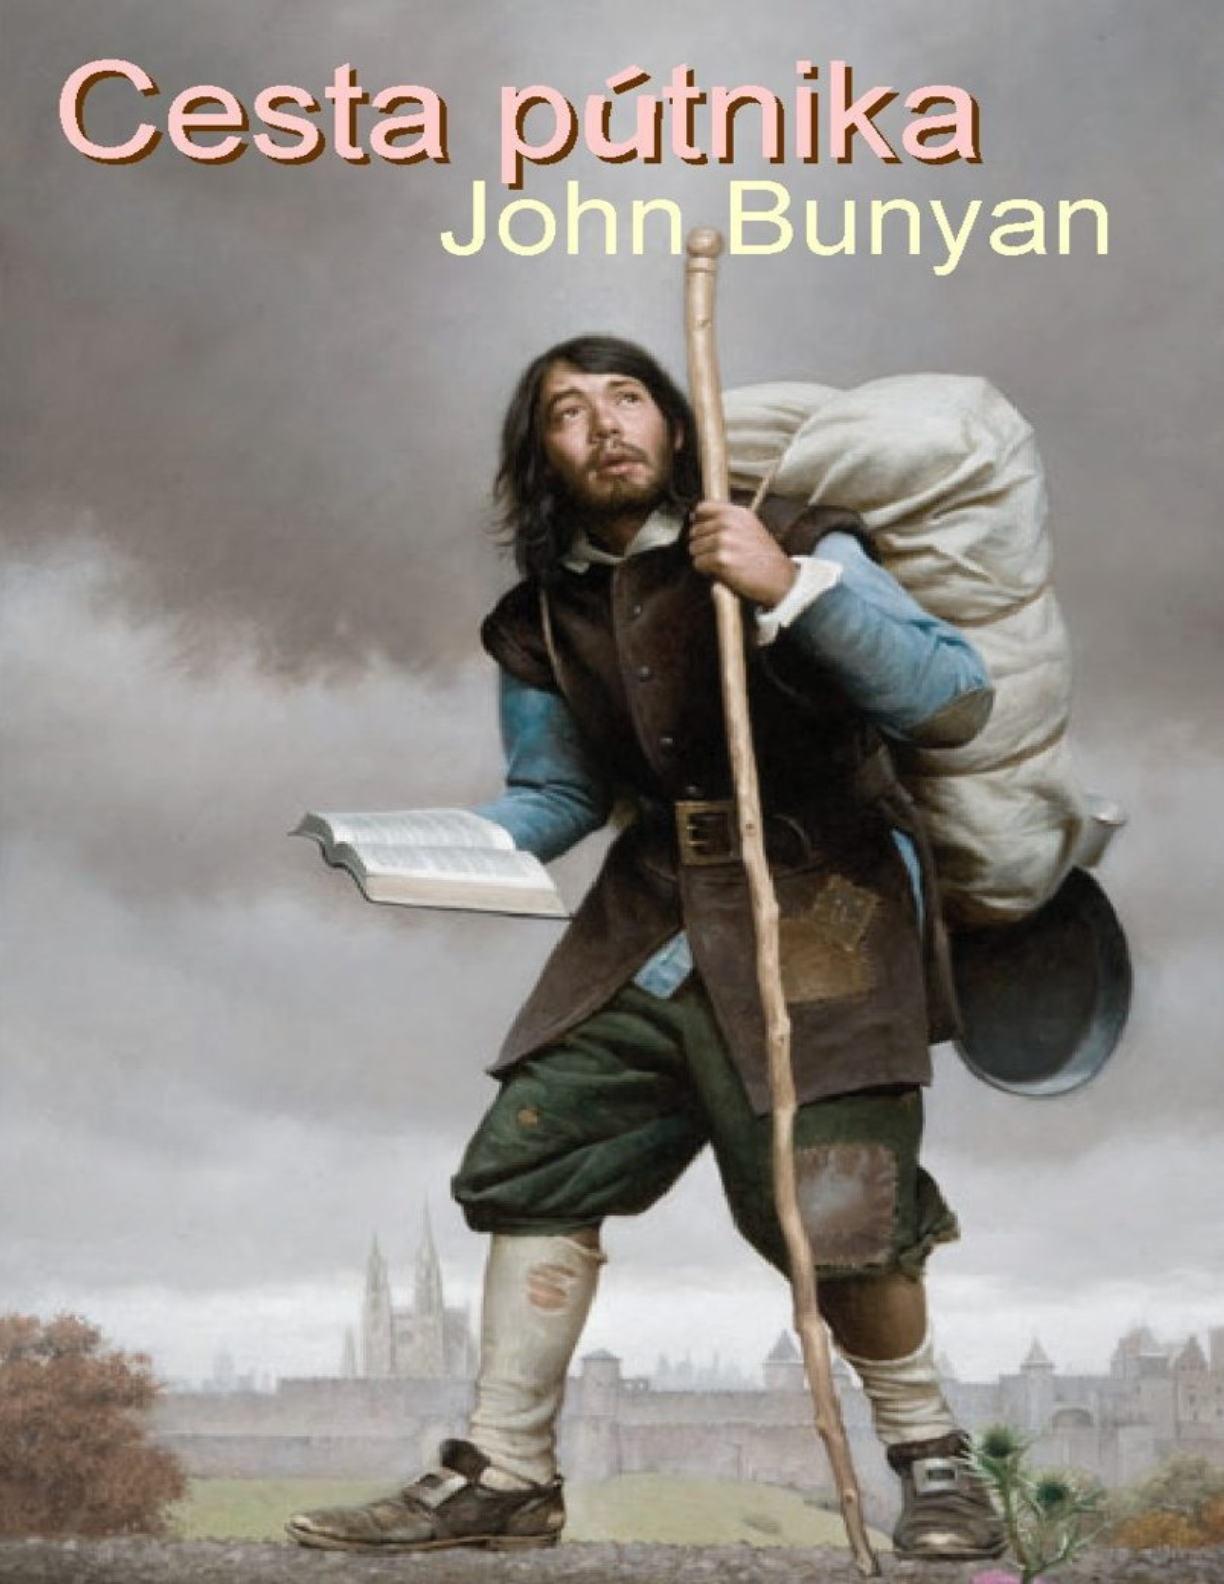 JohnBunyan Cestaputnika